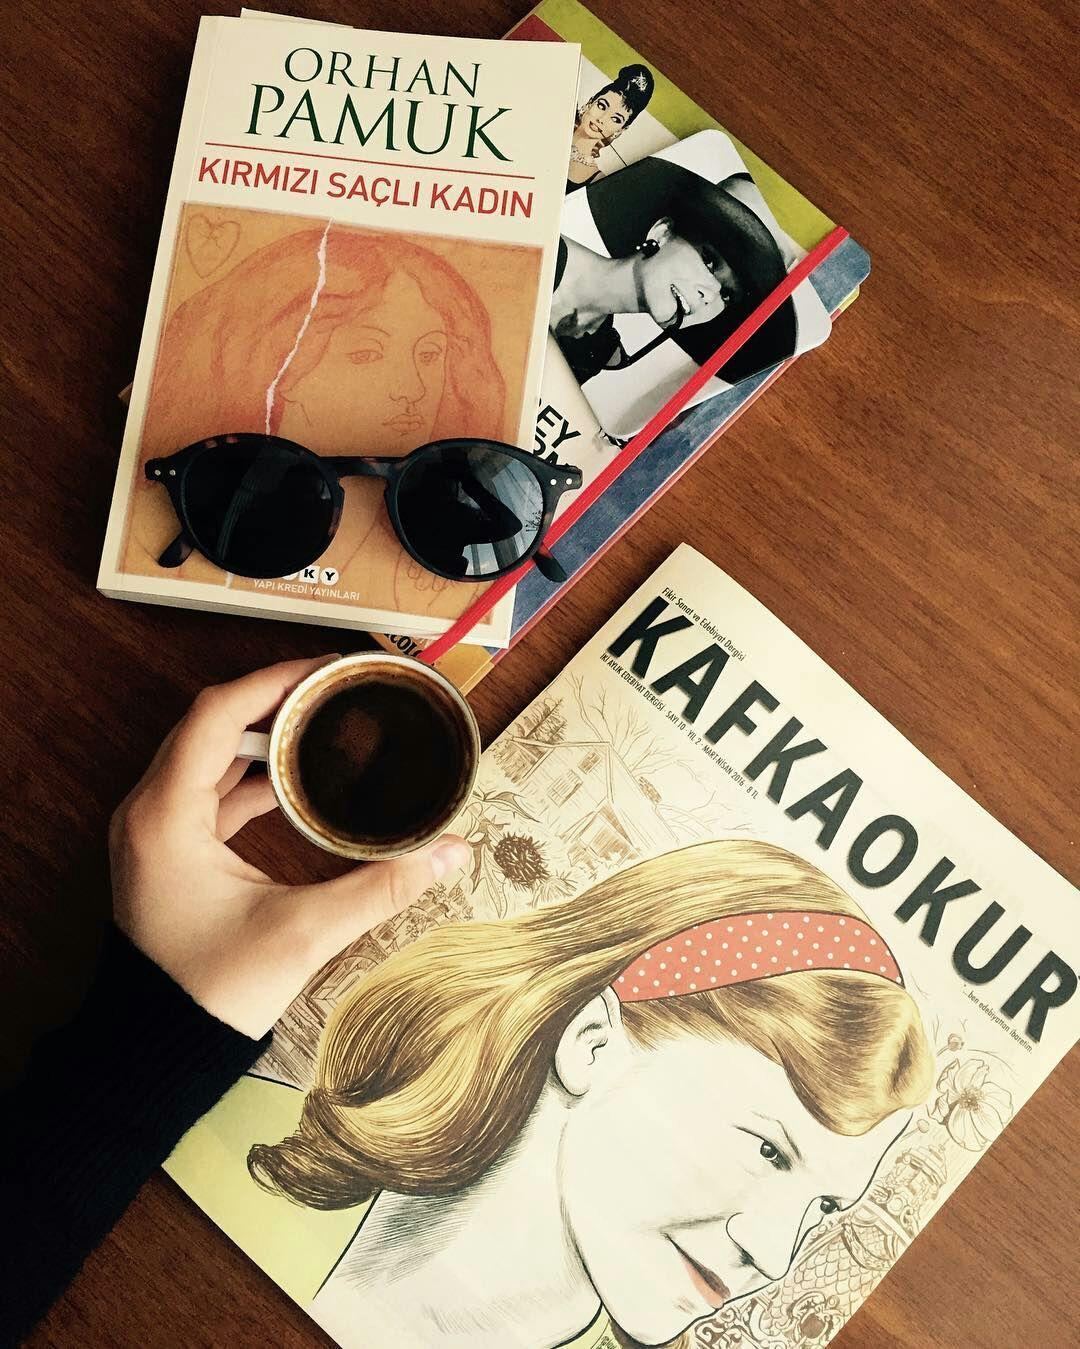 #D SUN Black fashion and design reading sunglasses by IZIPIZI